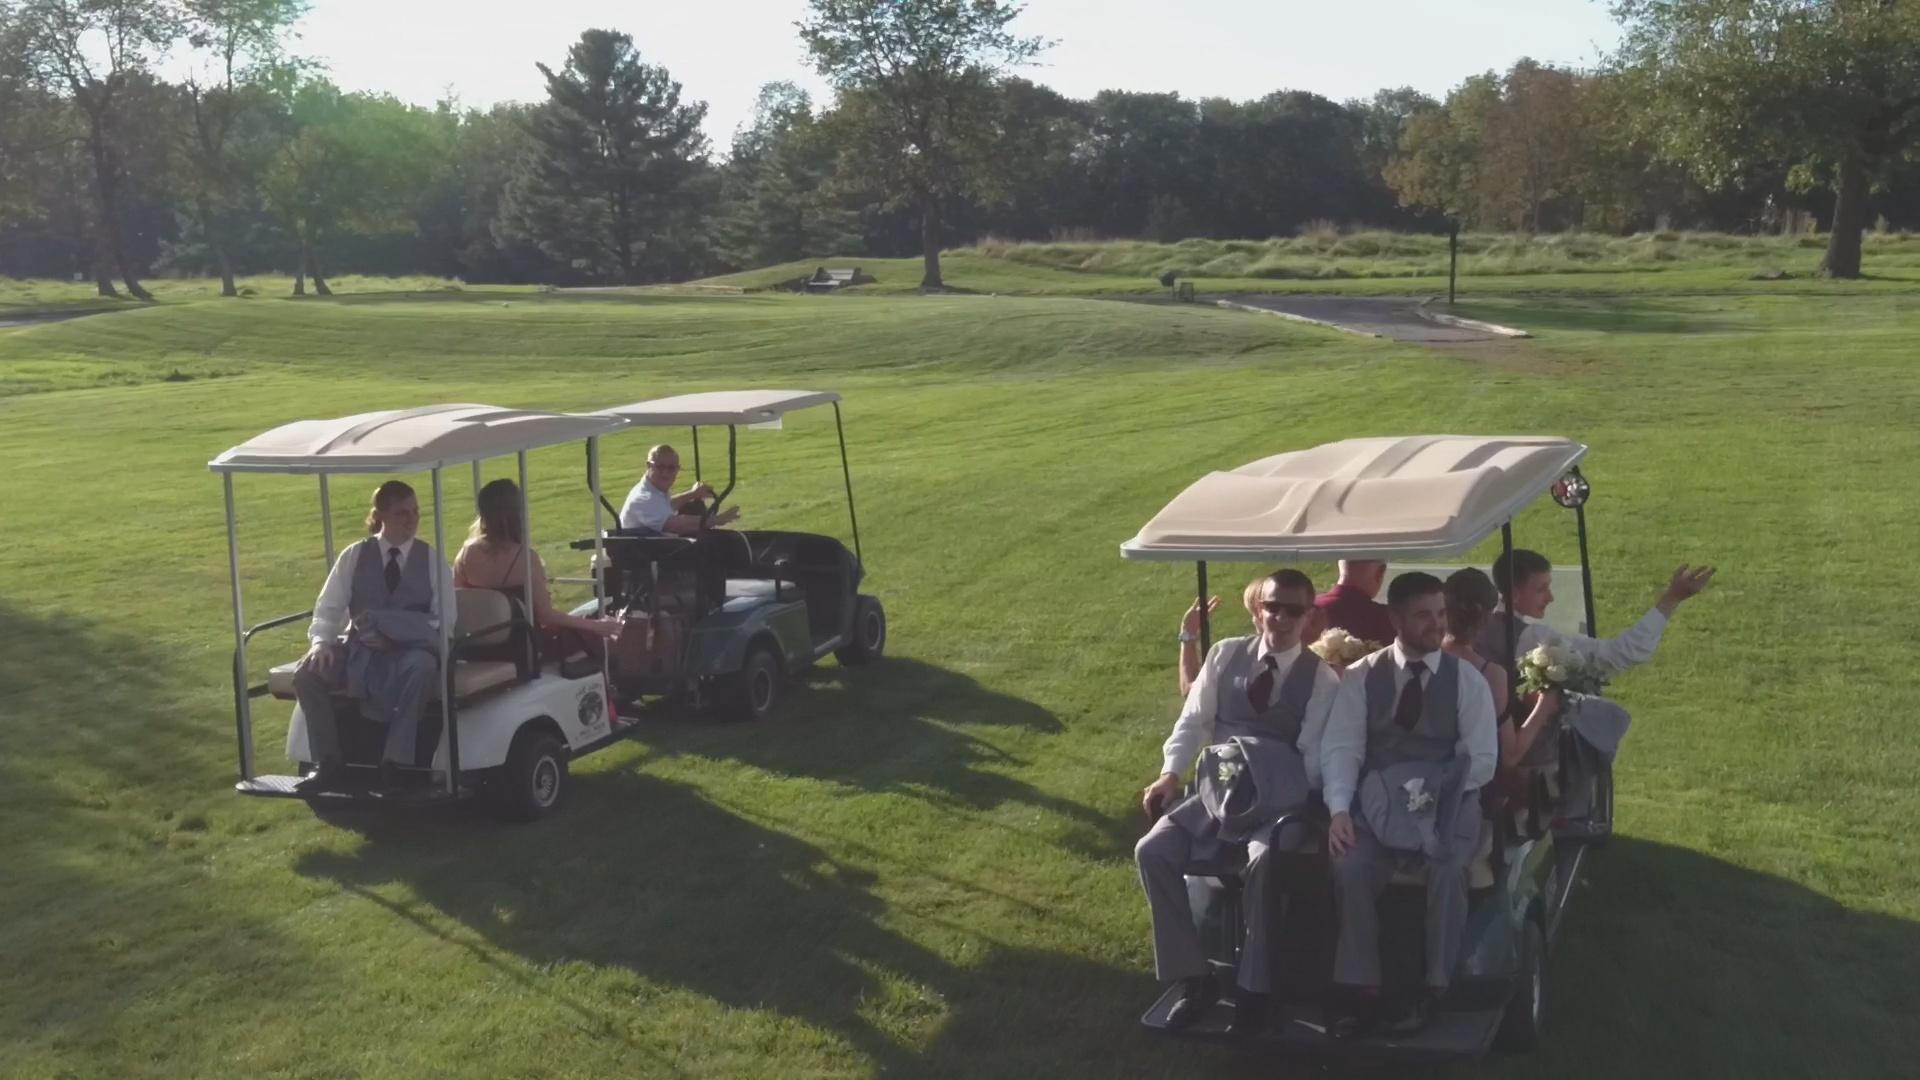 golf kart 1.jpg